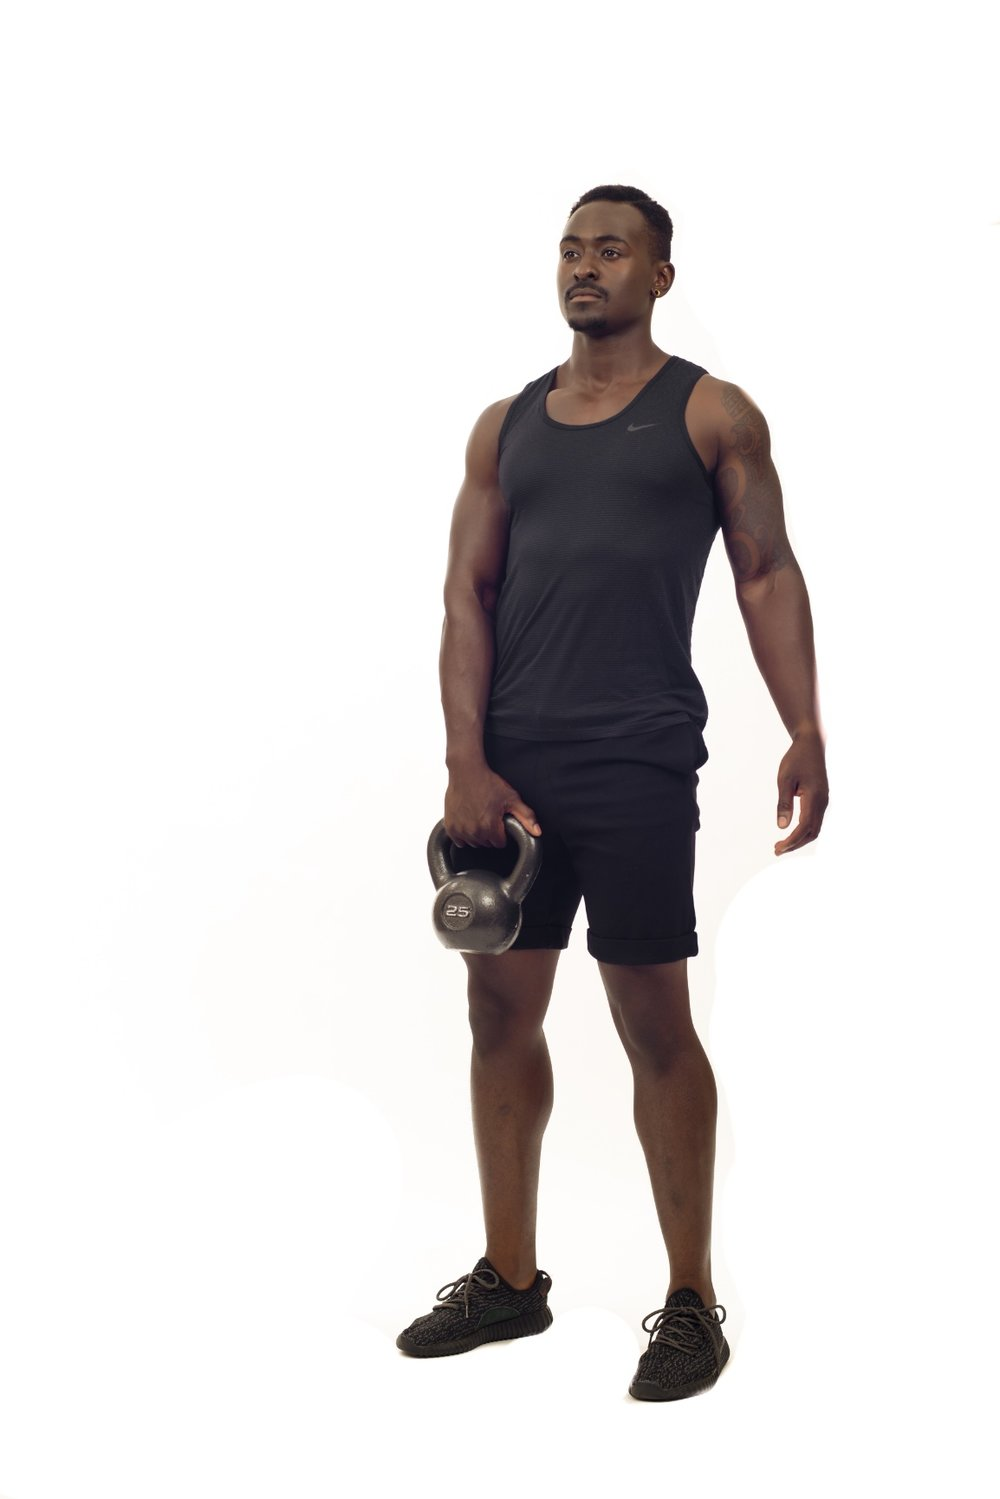 Reverse lunge-AJ.jpg